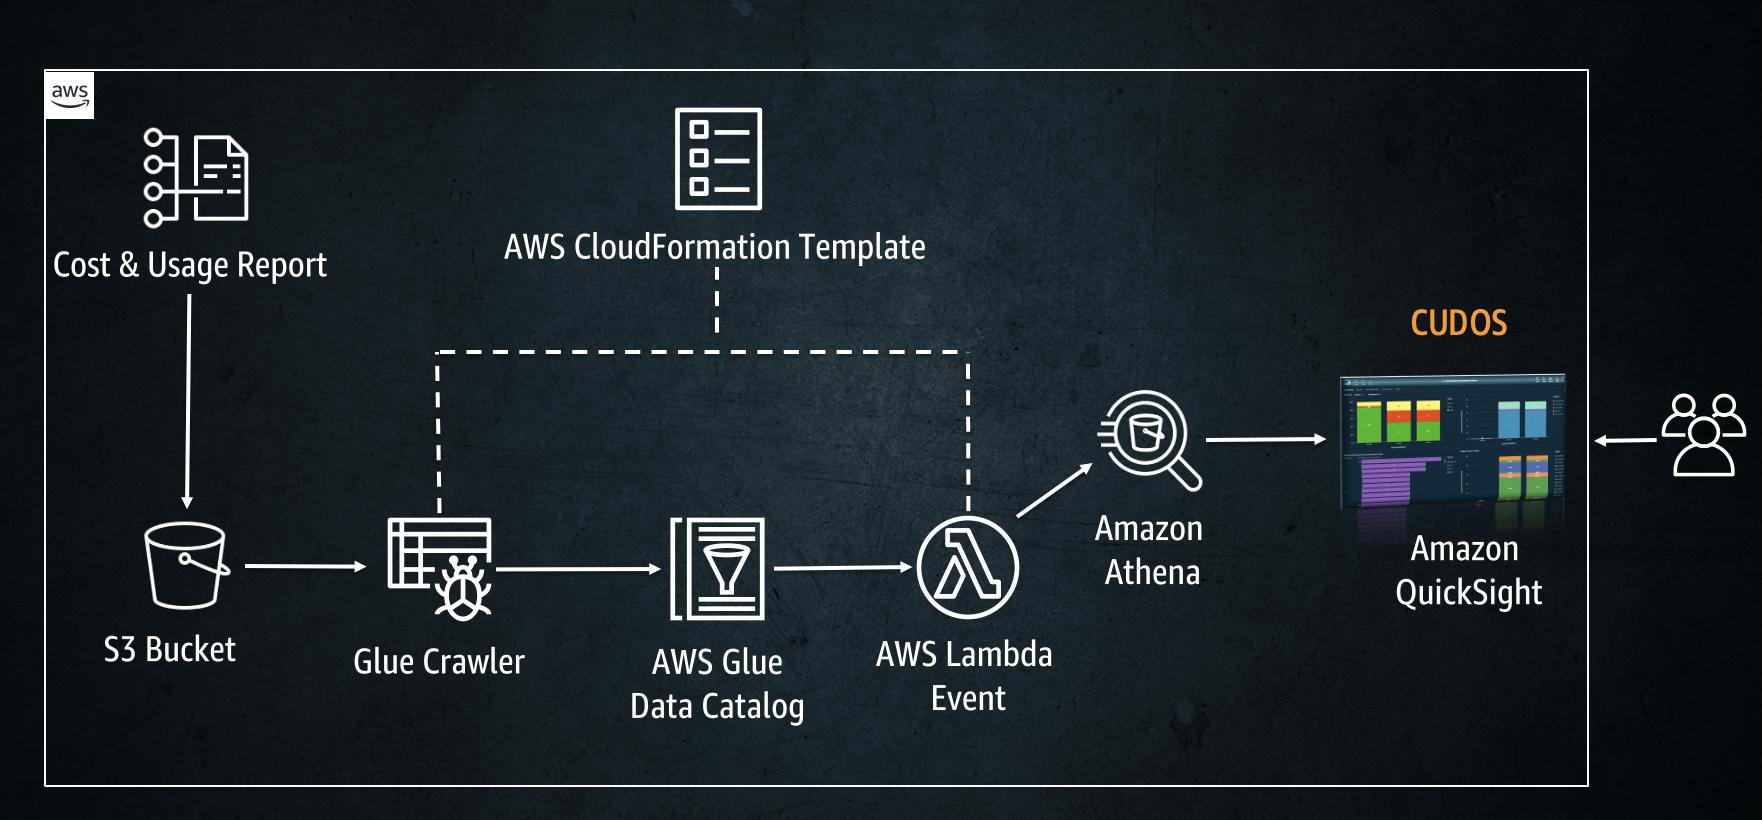 Diagram shows interaction between CUR, the S3 bucket, the AWS Glue crawler, a CloudFormation template, AWS Glue Data Catalog, an AWS Lambda event, Amazon Athena, and Amazon QuickSight.